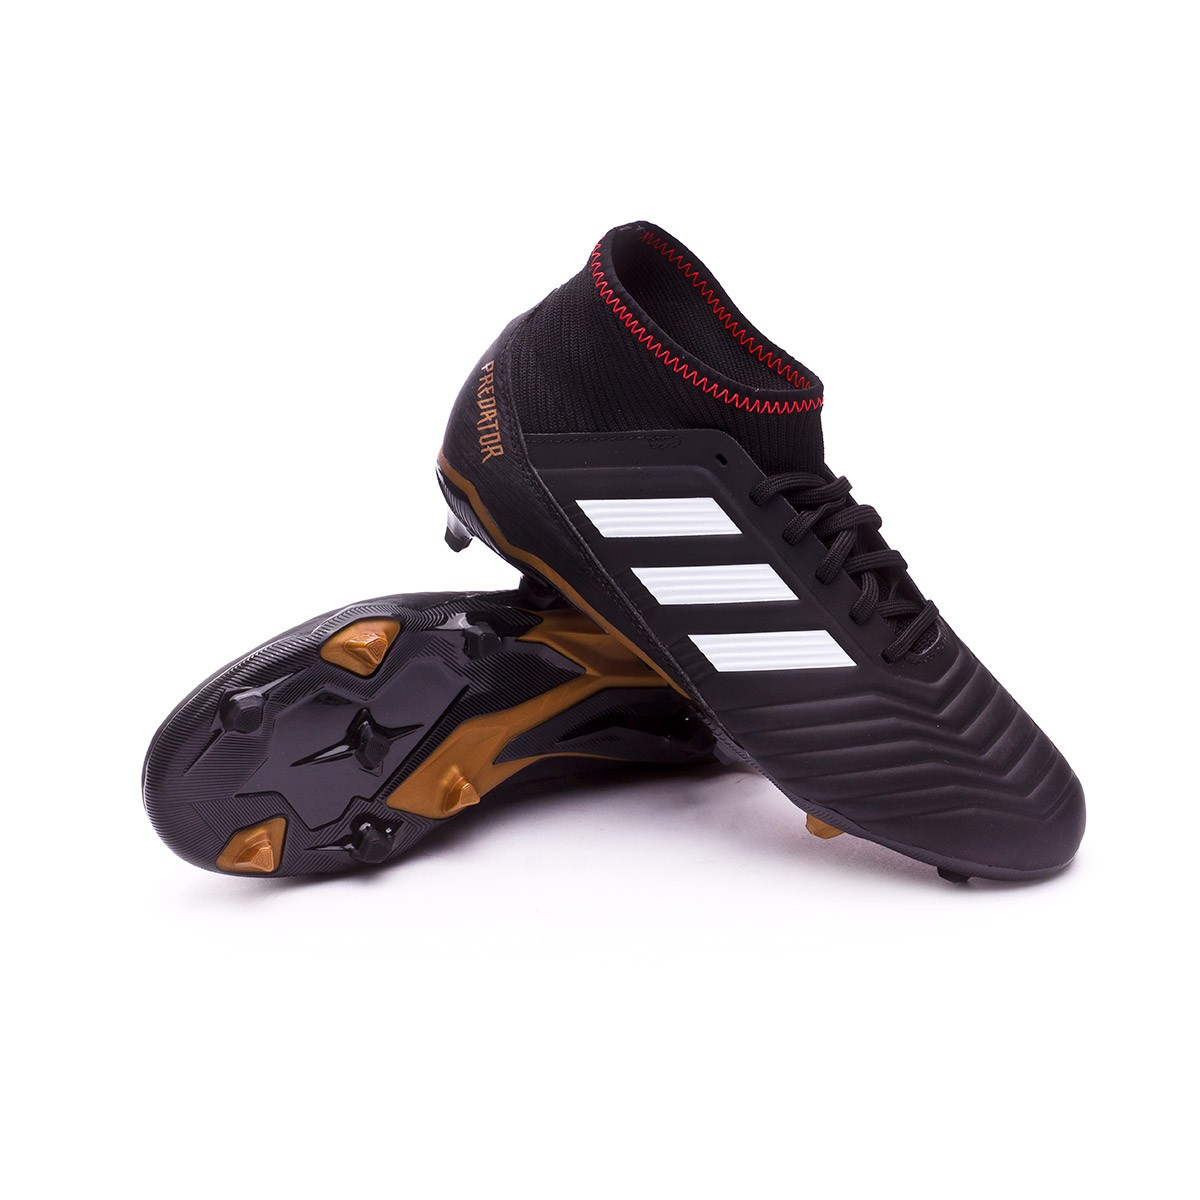 13f15588600 adidas Kids Predator 18.3 FG Football Boots. Core black-White-Gold ...